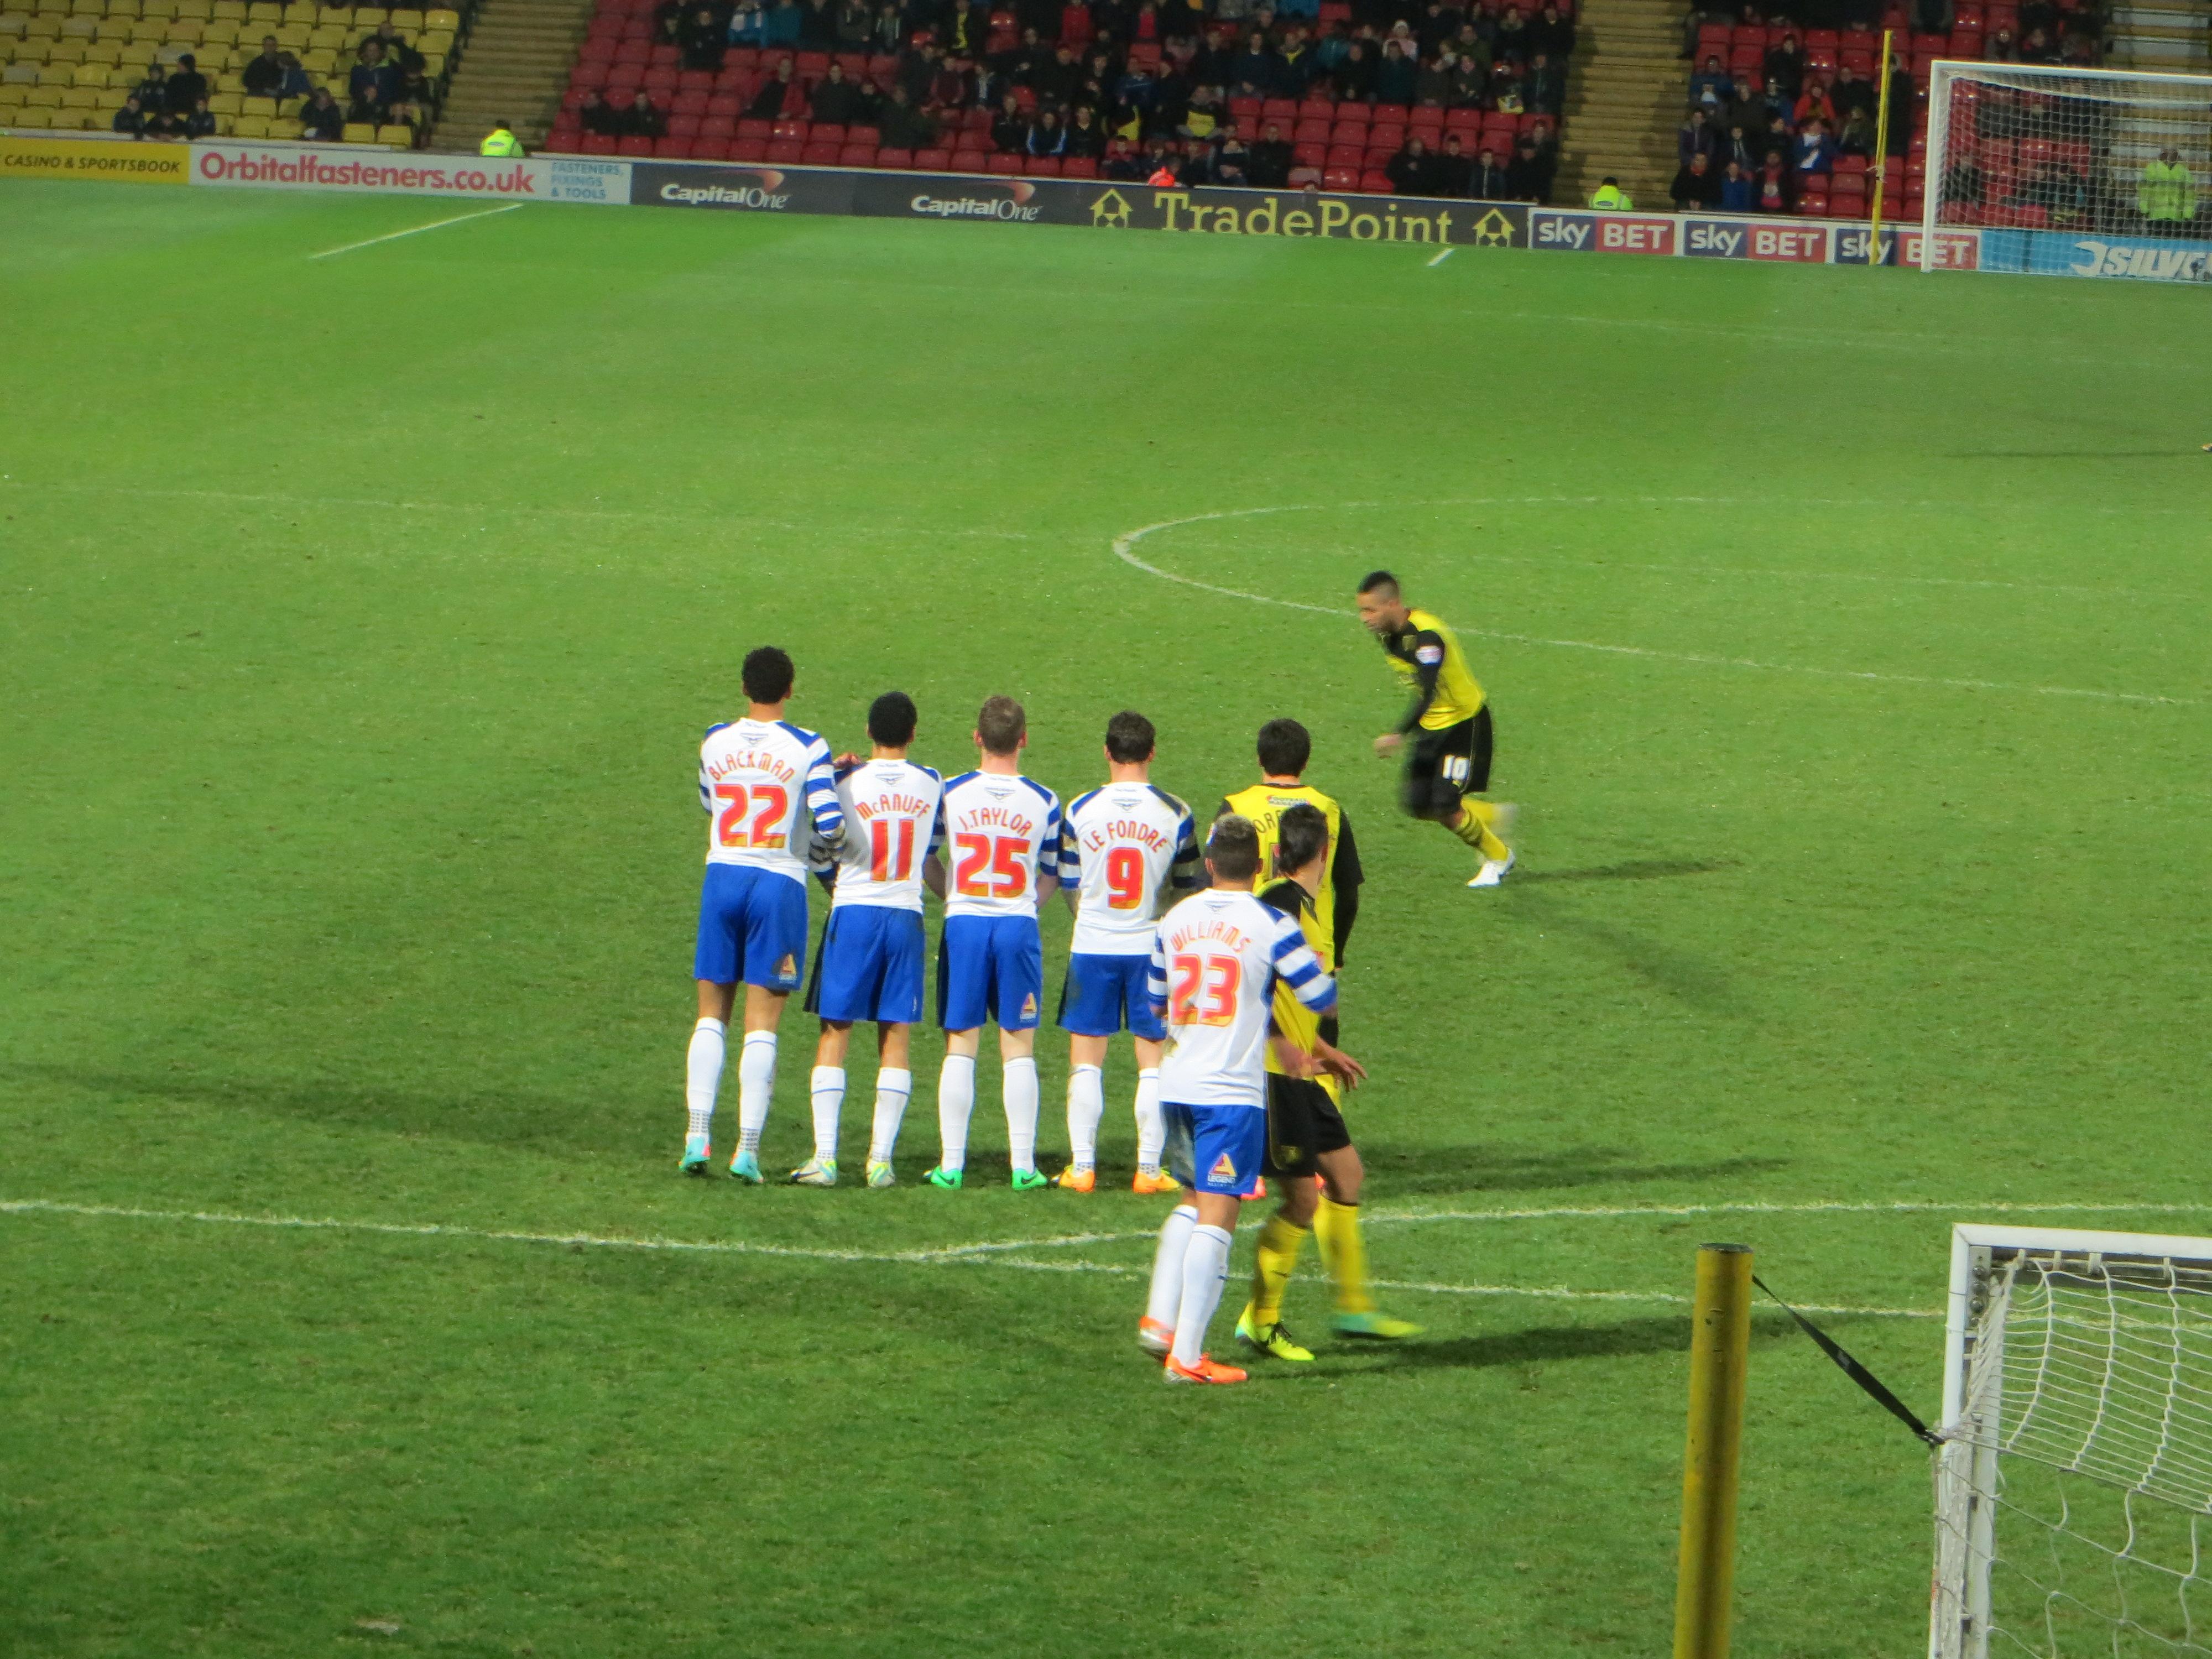 Lewis Mcgugan Free Kick Watford Mcgugan Takes a Free-kick